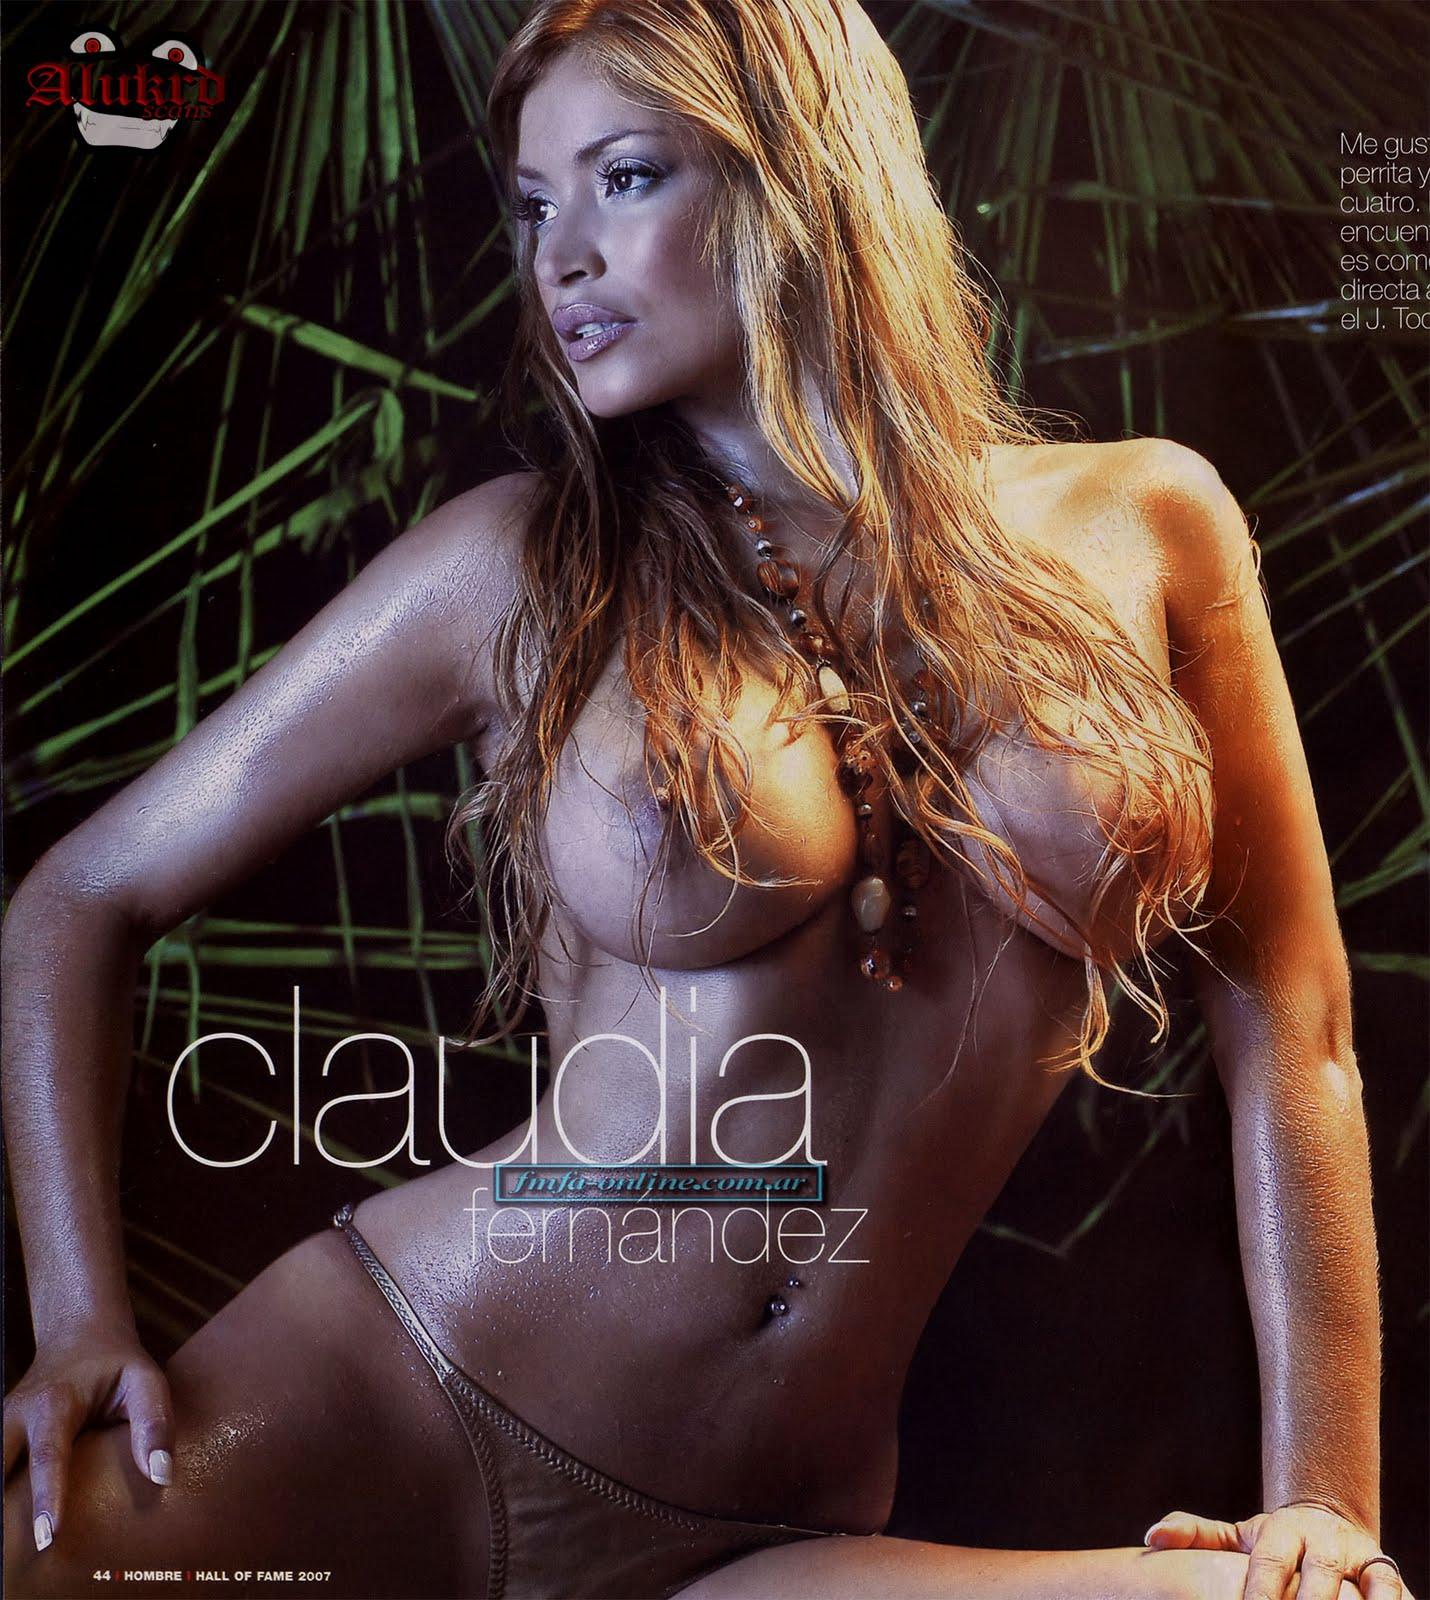 Androide mujer desnuda fondo de pantalla en vivo